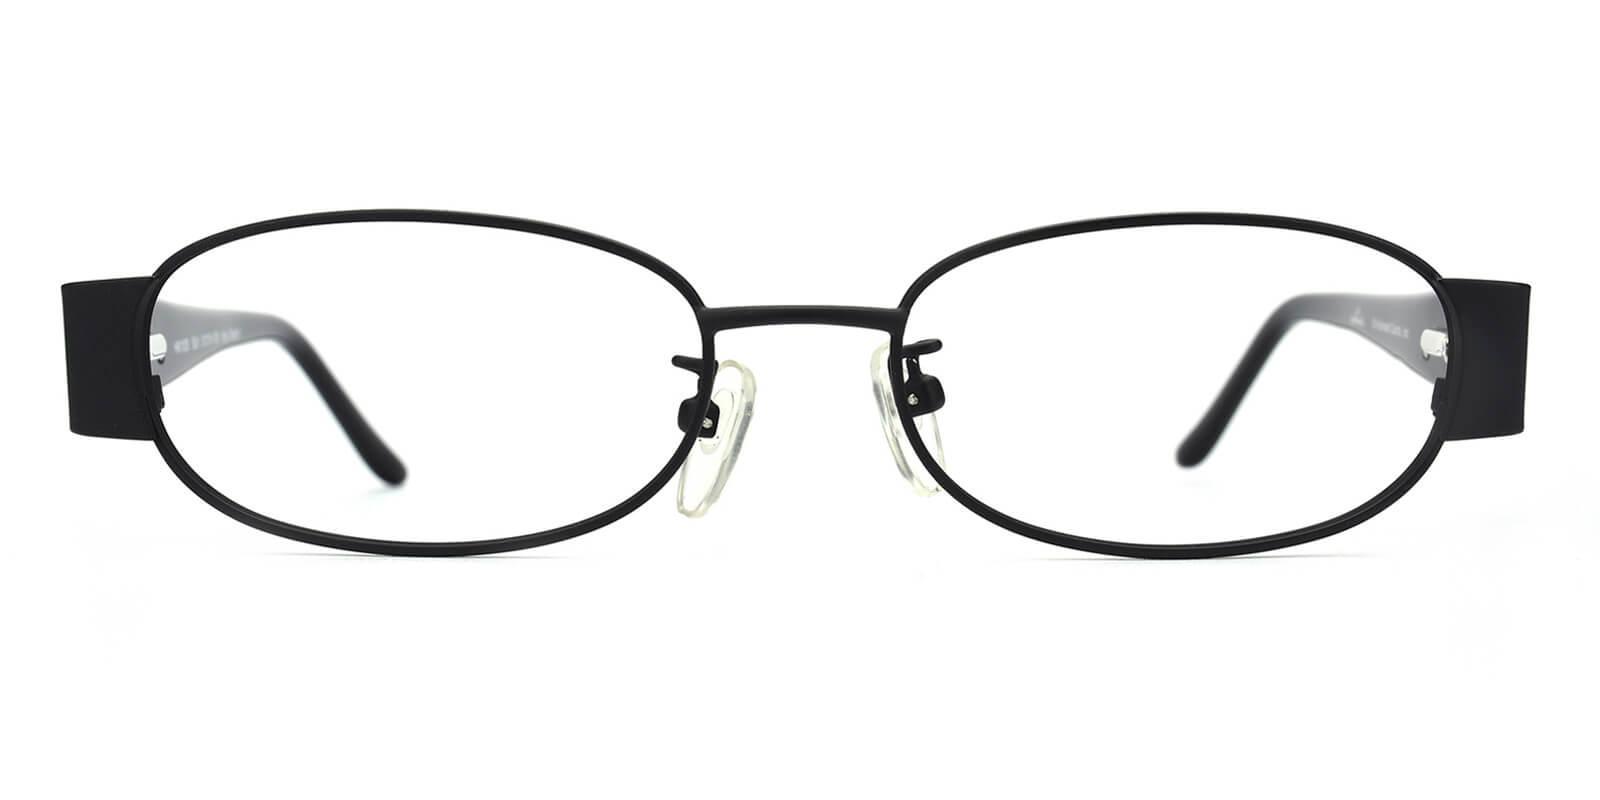 Angeline-Black-Rectangle-Metal-Eyeglasses-detail